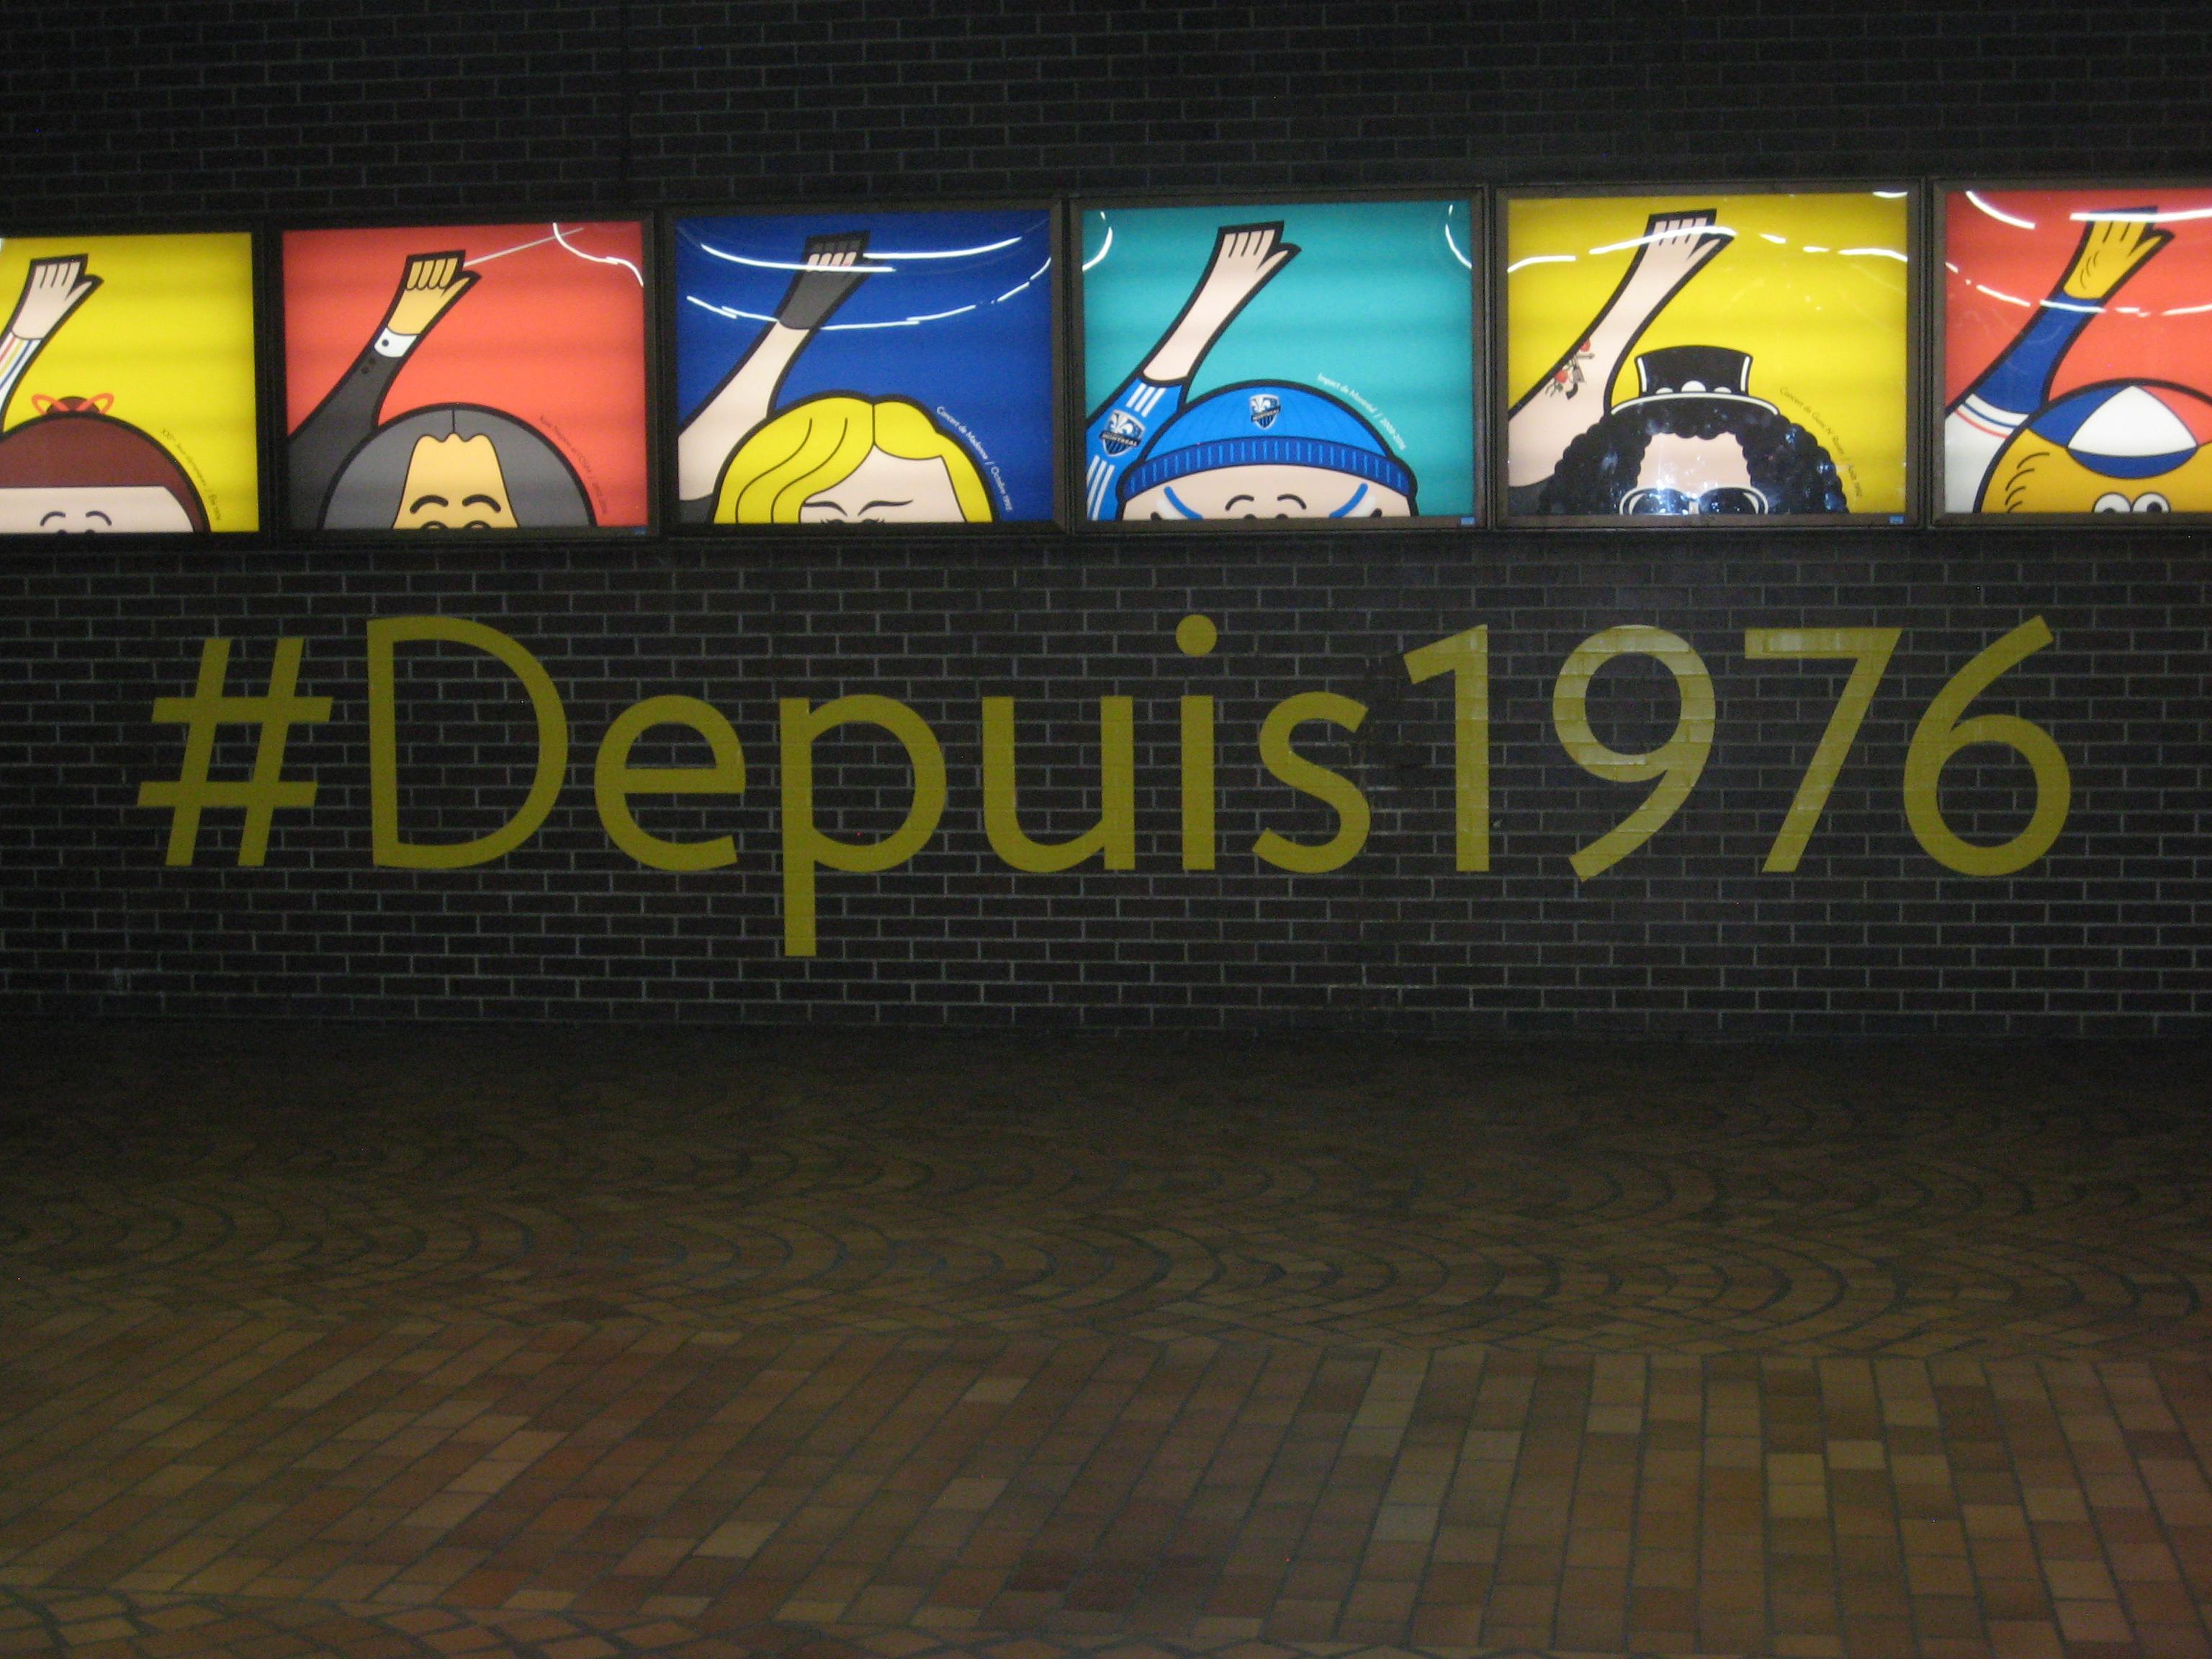 1976 Olympics sign